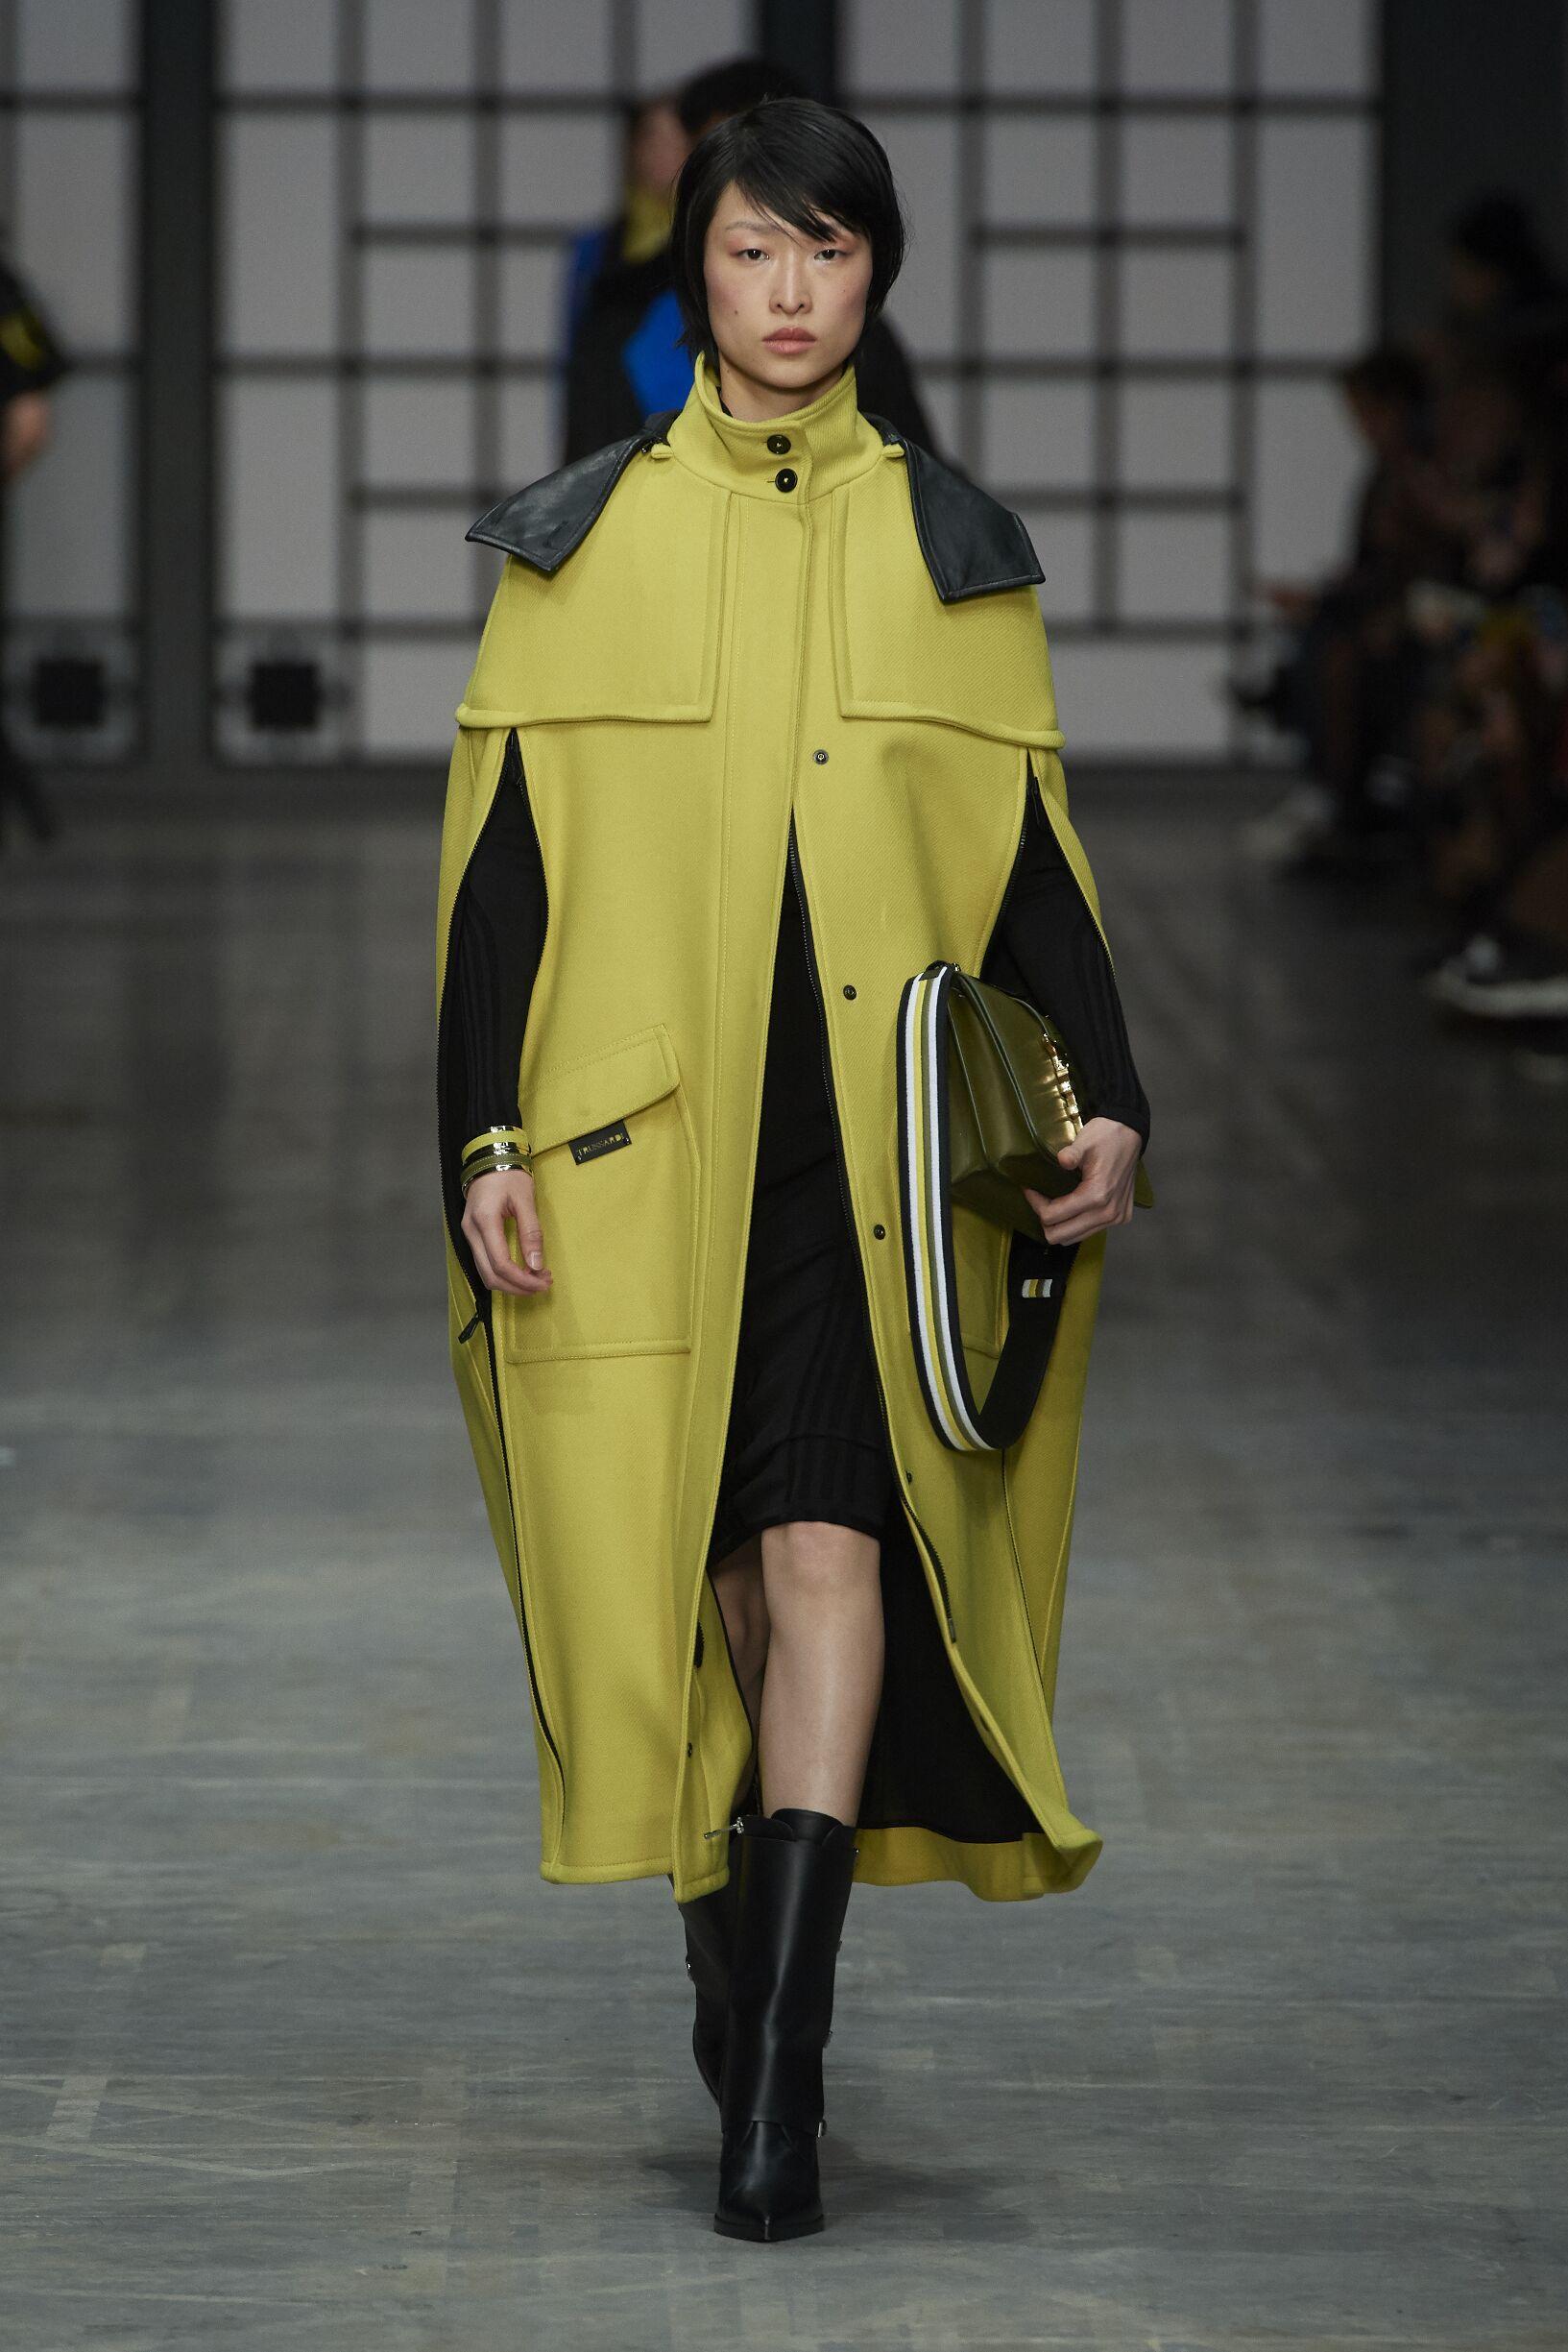 Trussardi Woman Style 2018